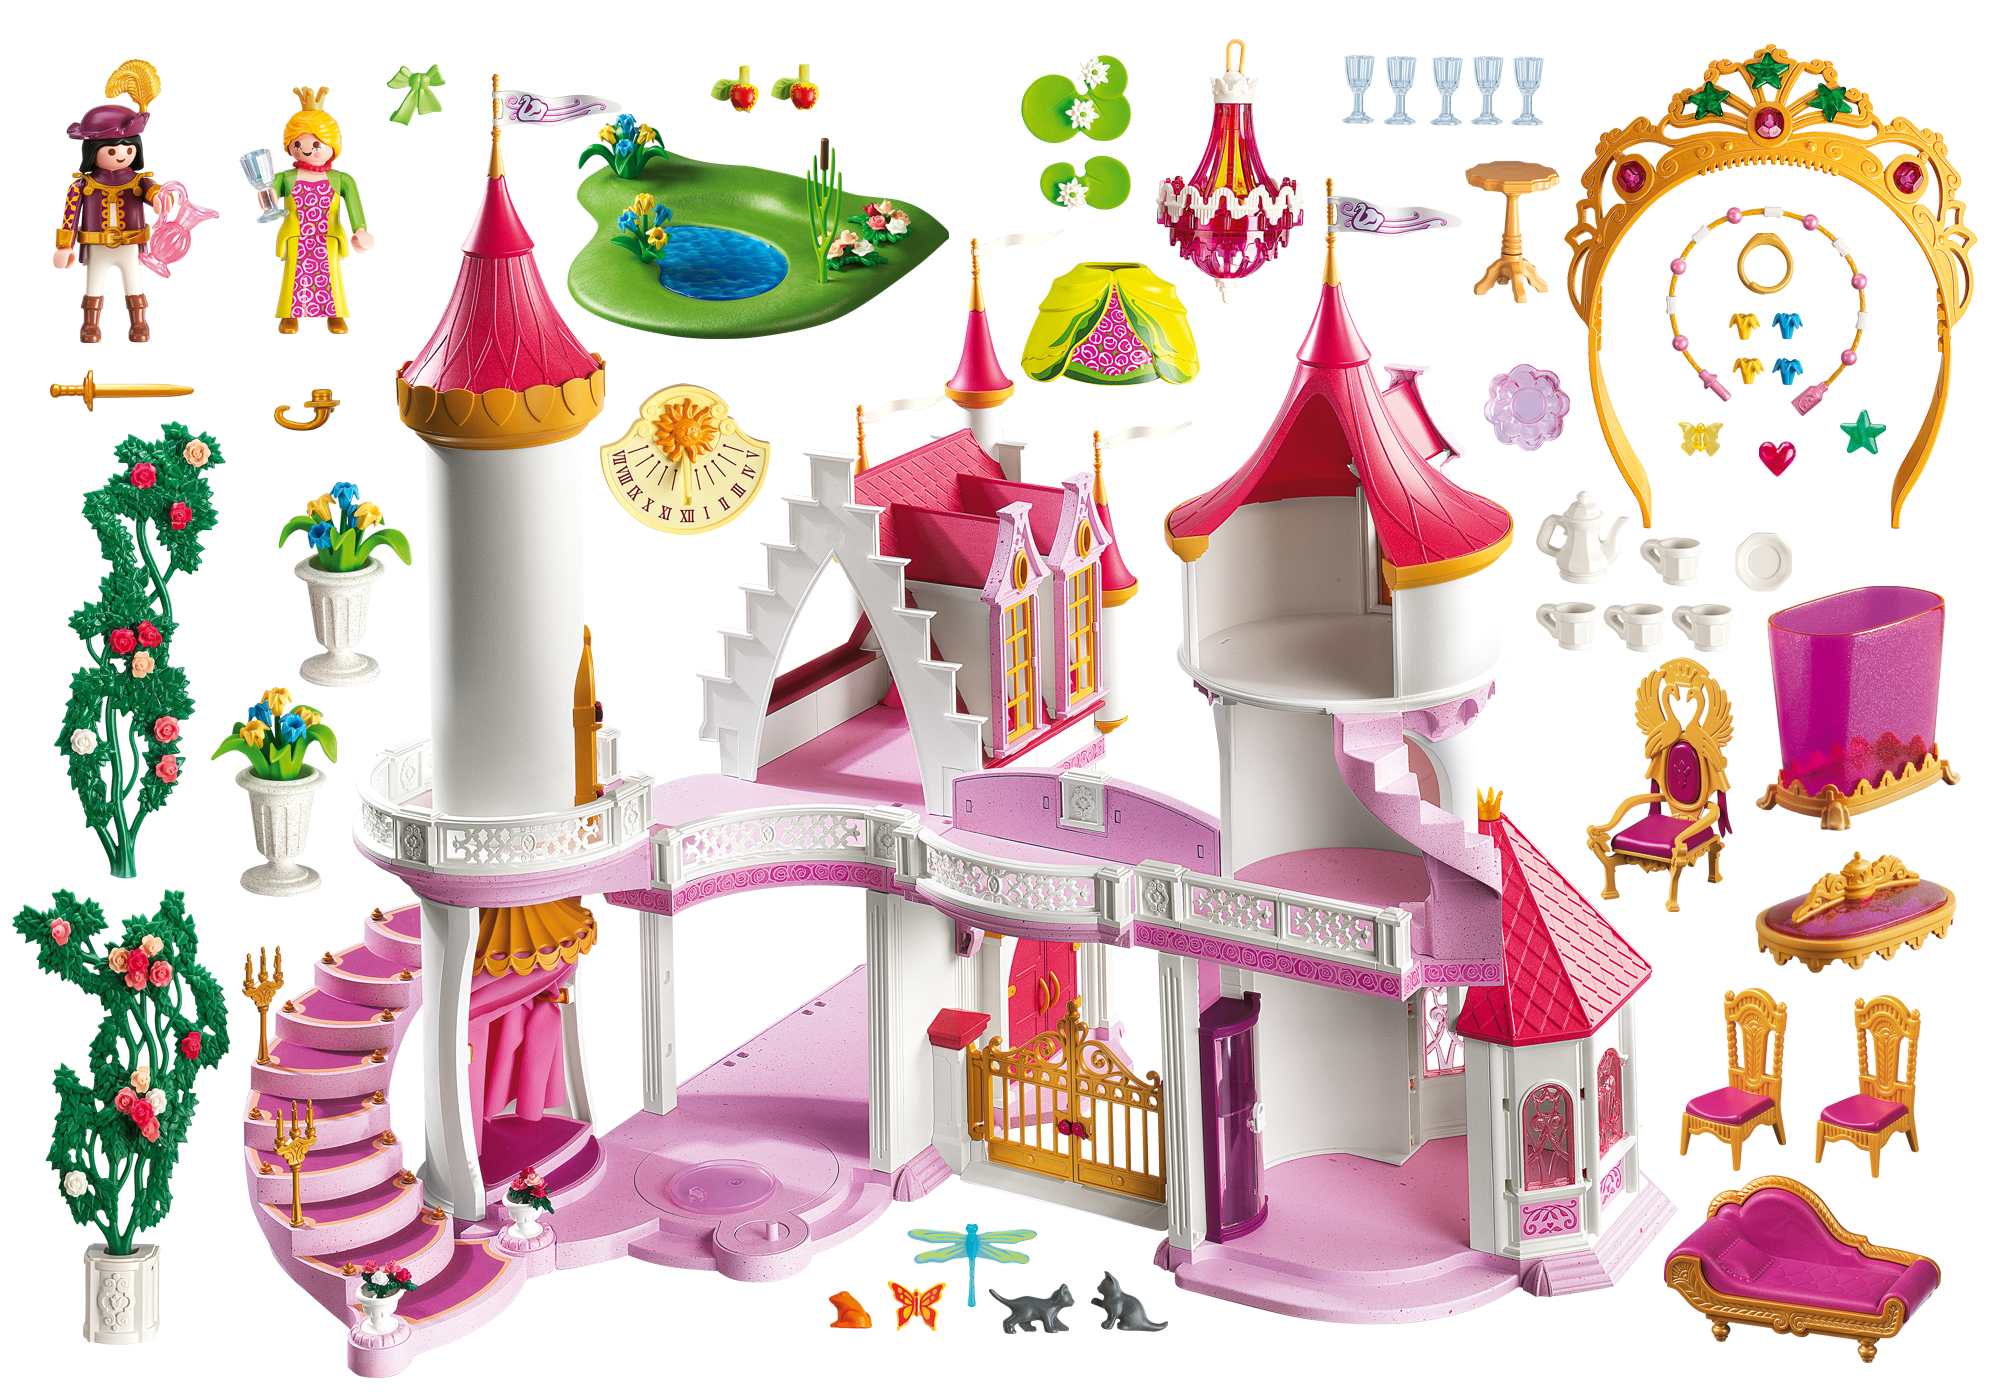 Chateaux playmobil princesse chateaux playmobil princesse for Chateau playmobil princesse 5142